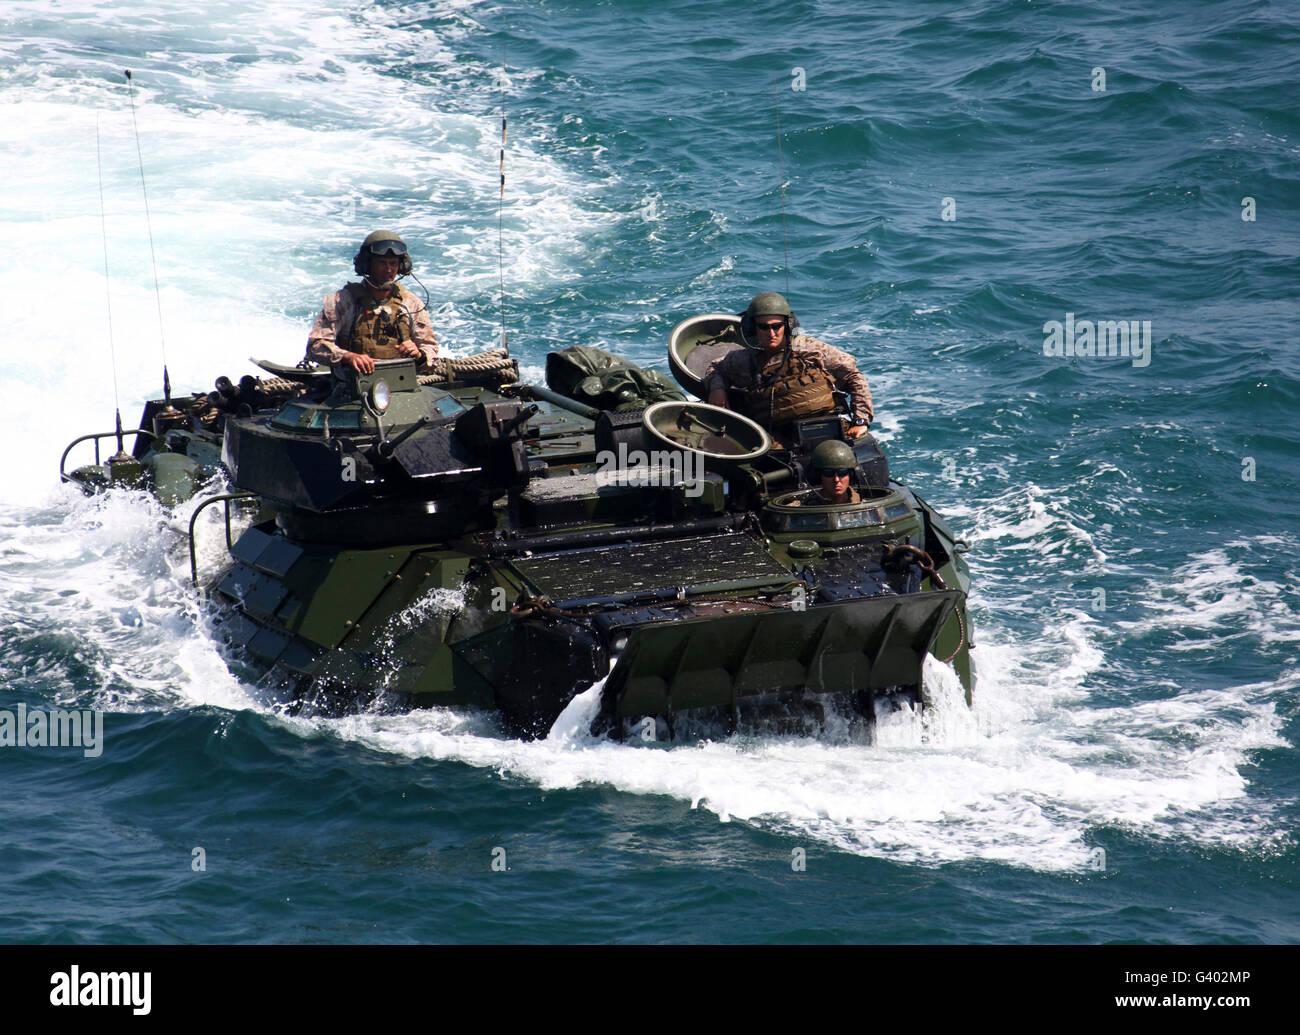 Marines operate an amphibious assault vehicle. Stock Photo